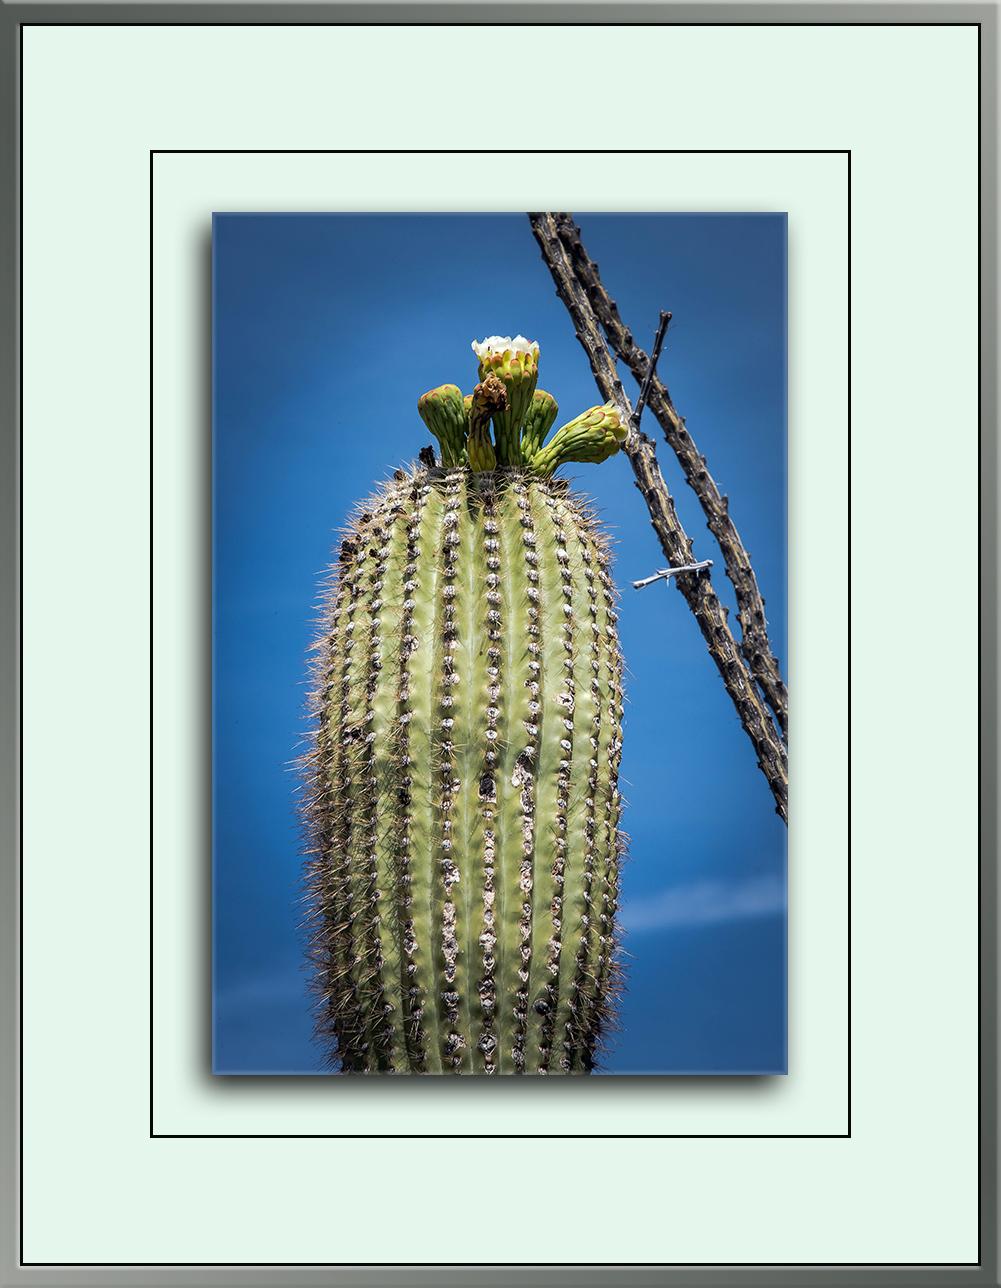 Saguaron Blossom (1 of 1)-2 blog